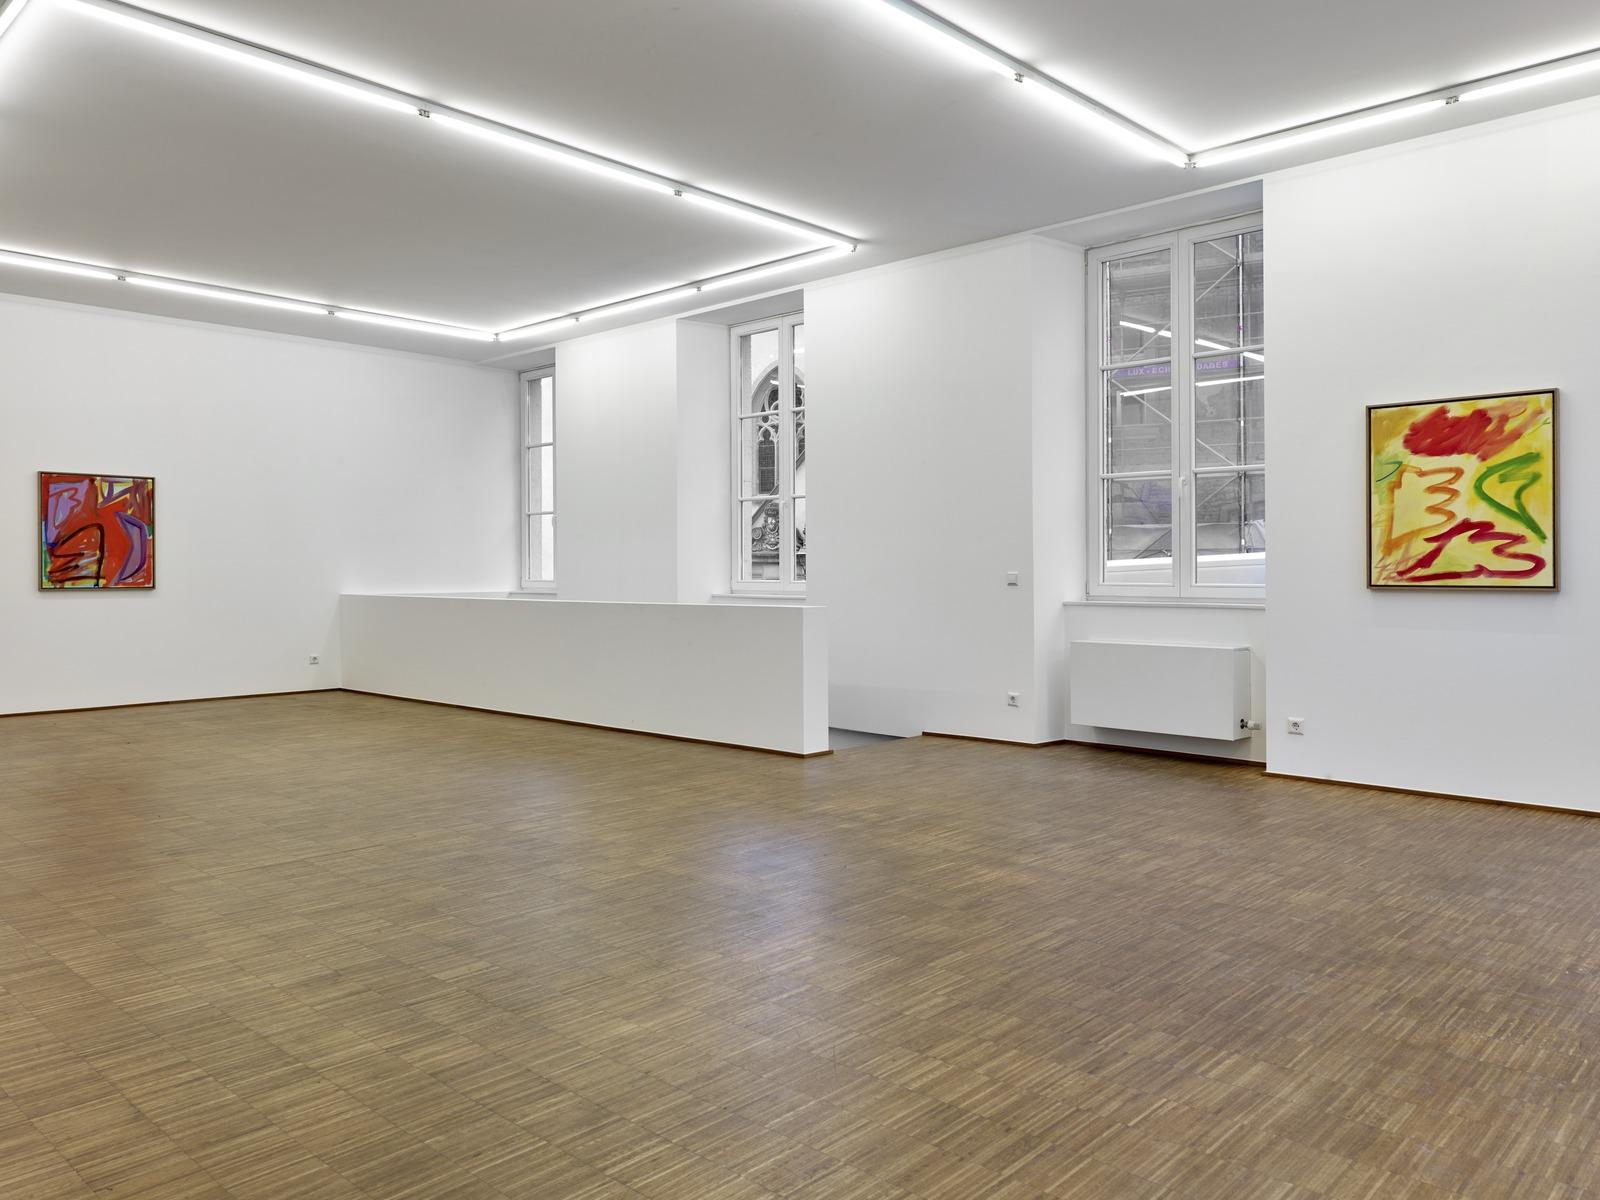 3_Sadie Laska 2015 luxembourg 1005